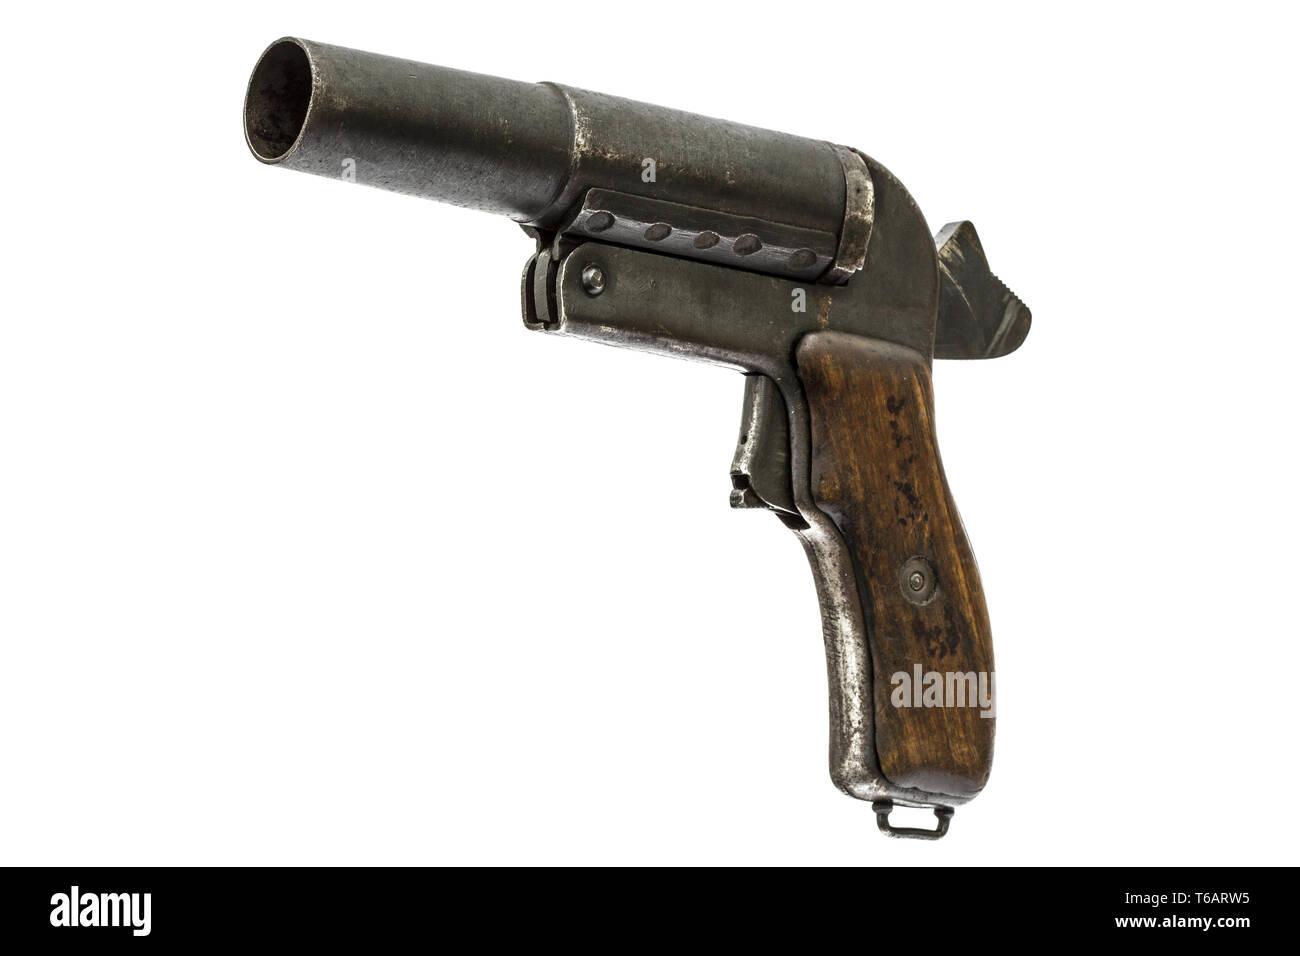 Military Flare Pistol Stock Photos & Military Flare Pistol